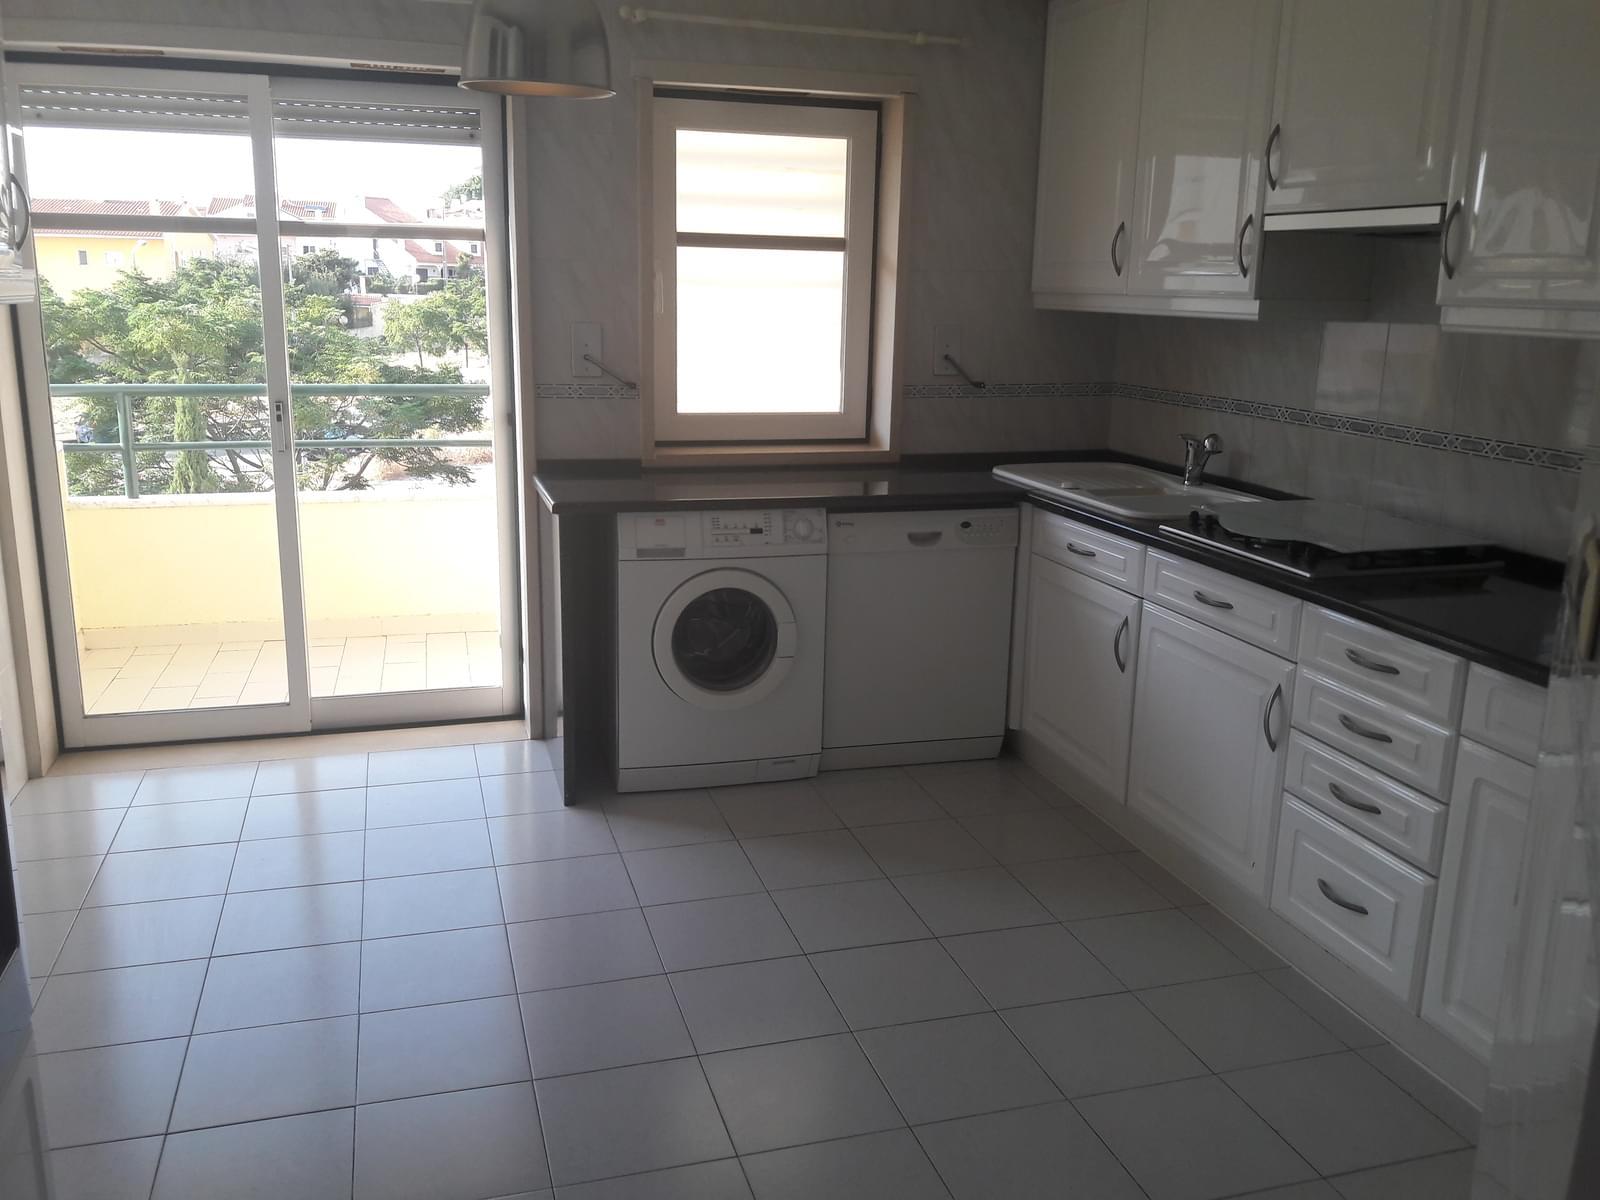 pf18038-apartamento-t3-3eea95a0-7268-4228-9907-6c0ad3f3d0b5